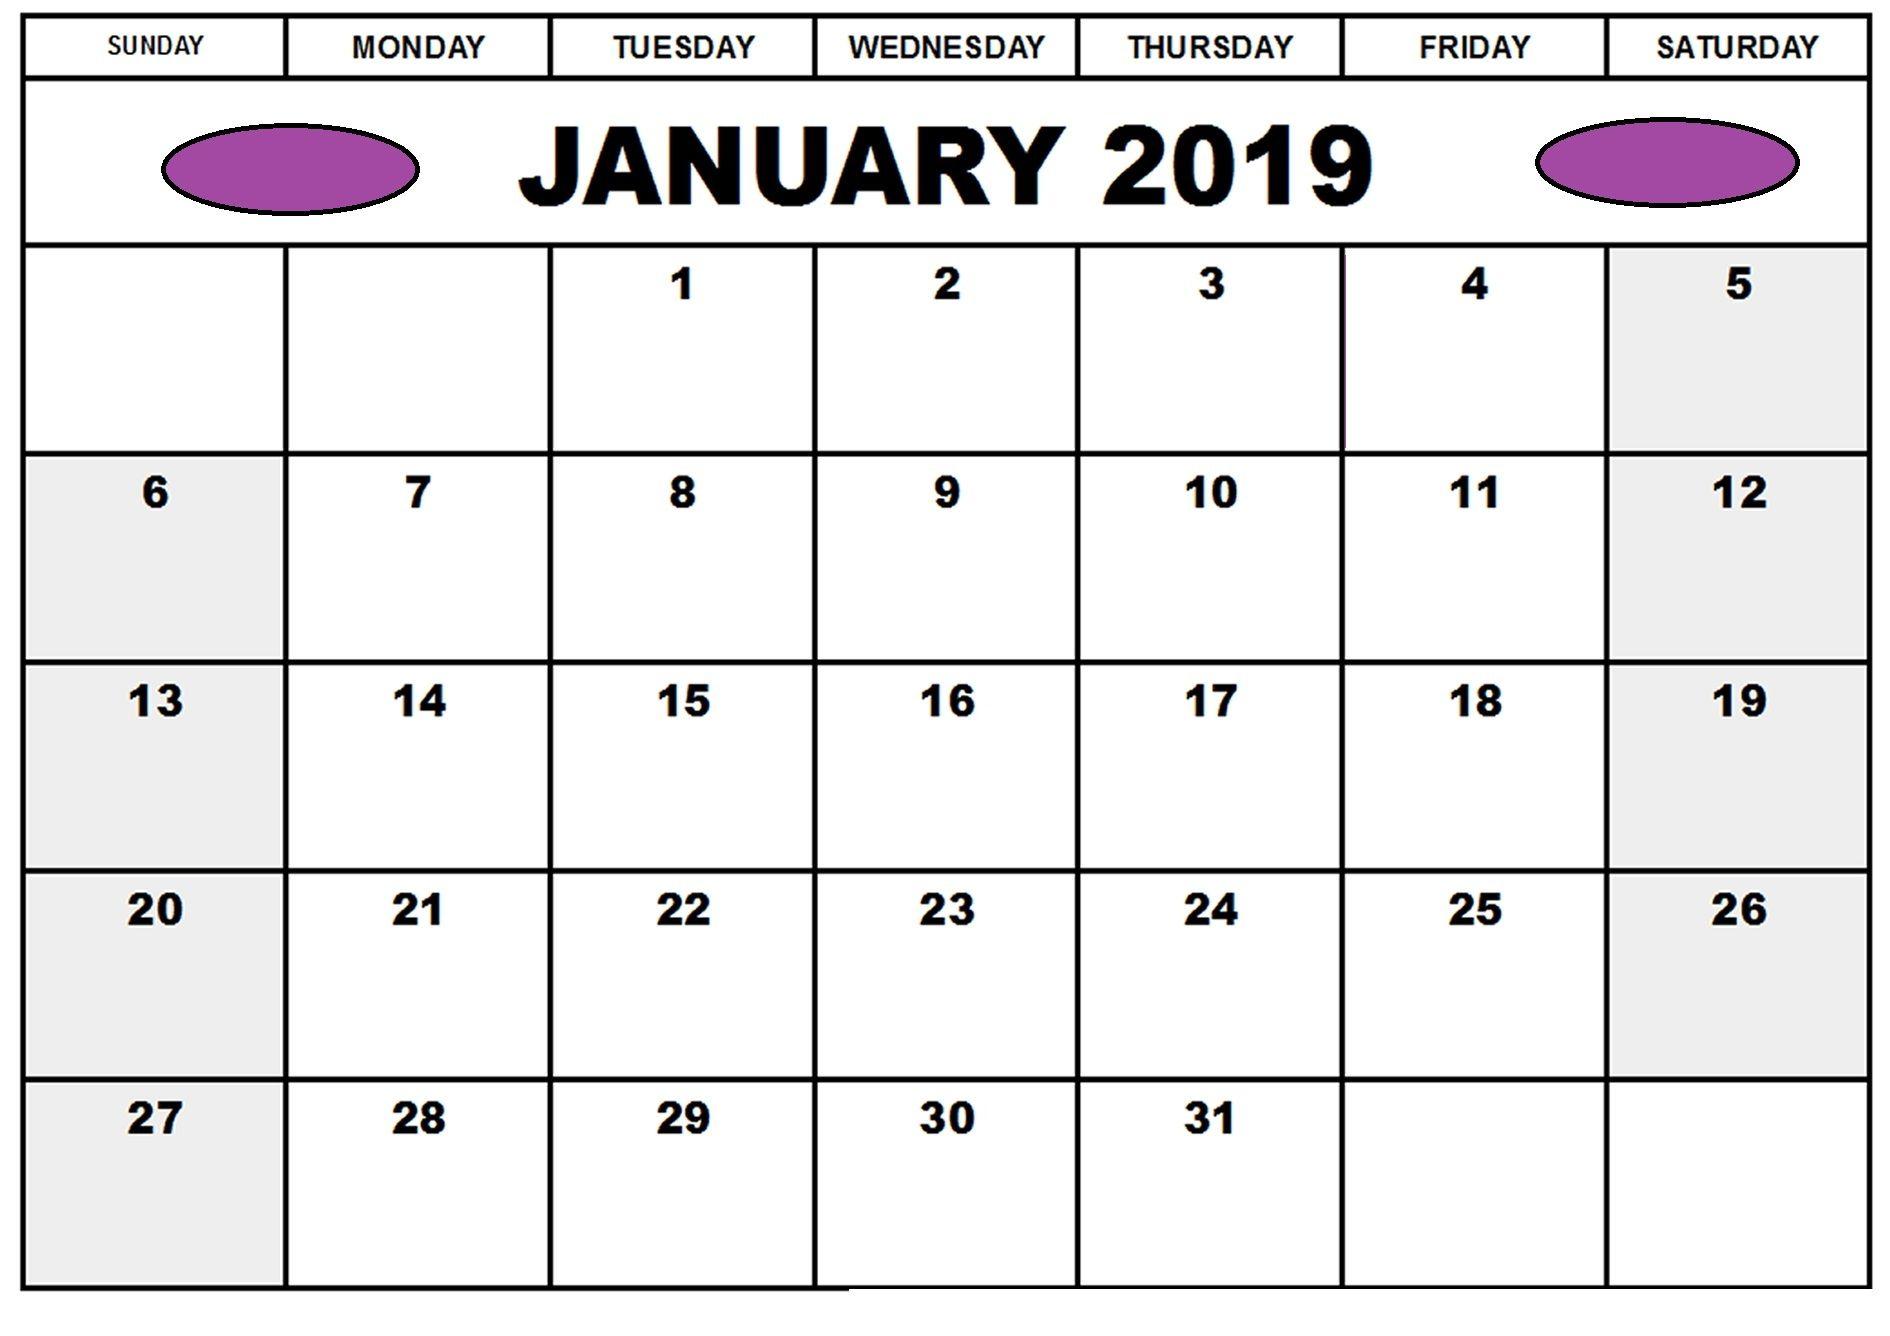 Printable January 2019 Calendar Word January 2019 Calendar Word Printable | January 2019 Printable